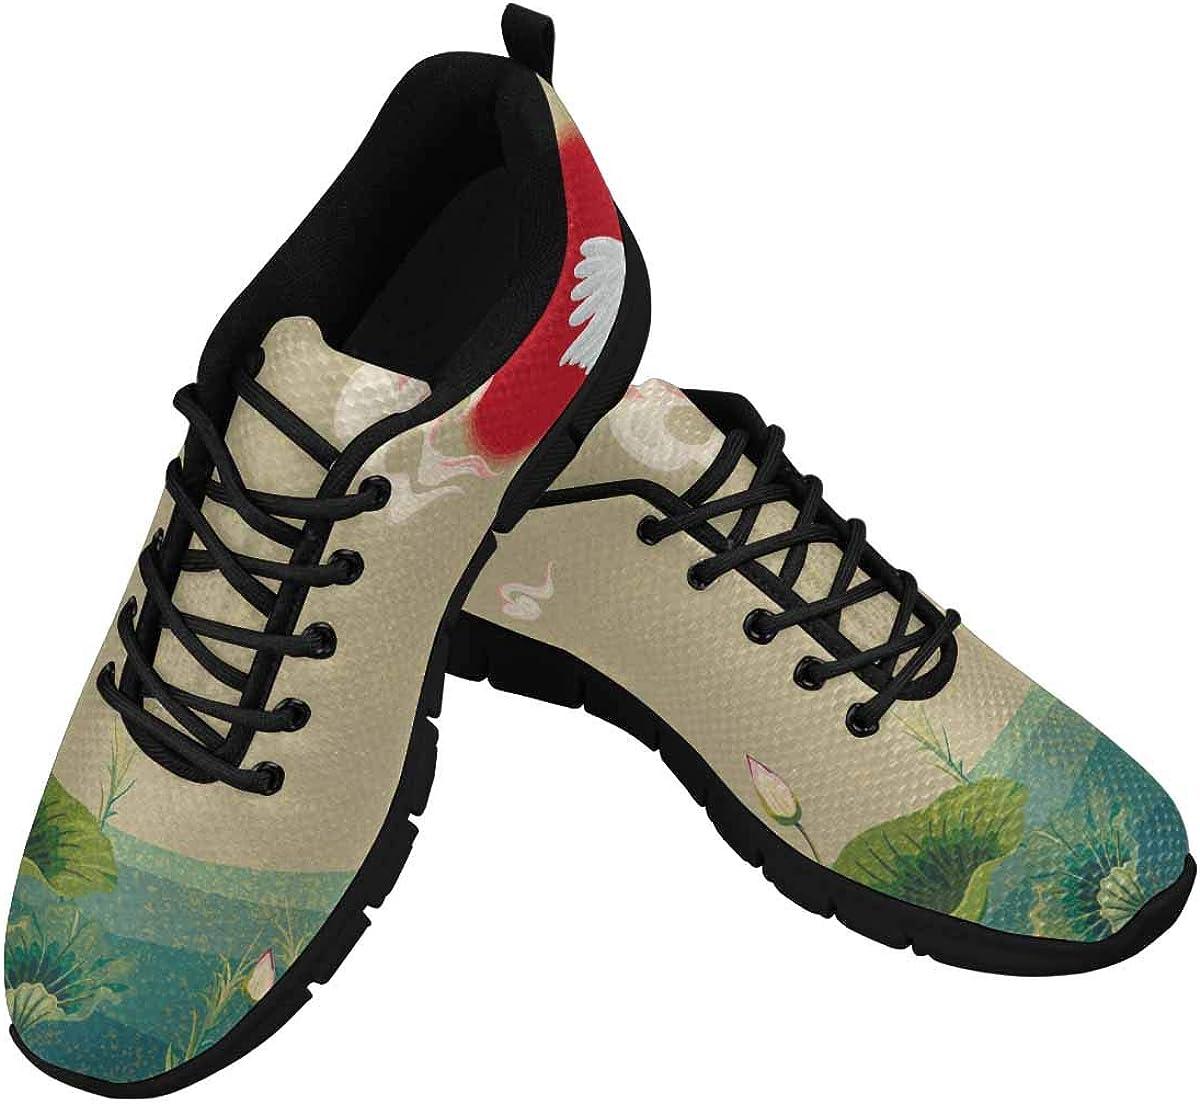 INTERESTPRINT Japanese Cranes at Sunset Women's Athletic Walking Shoes Comfort Mesh Non Slip